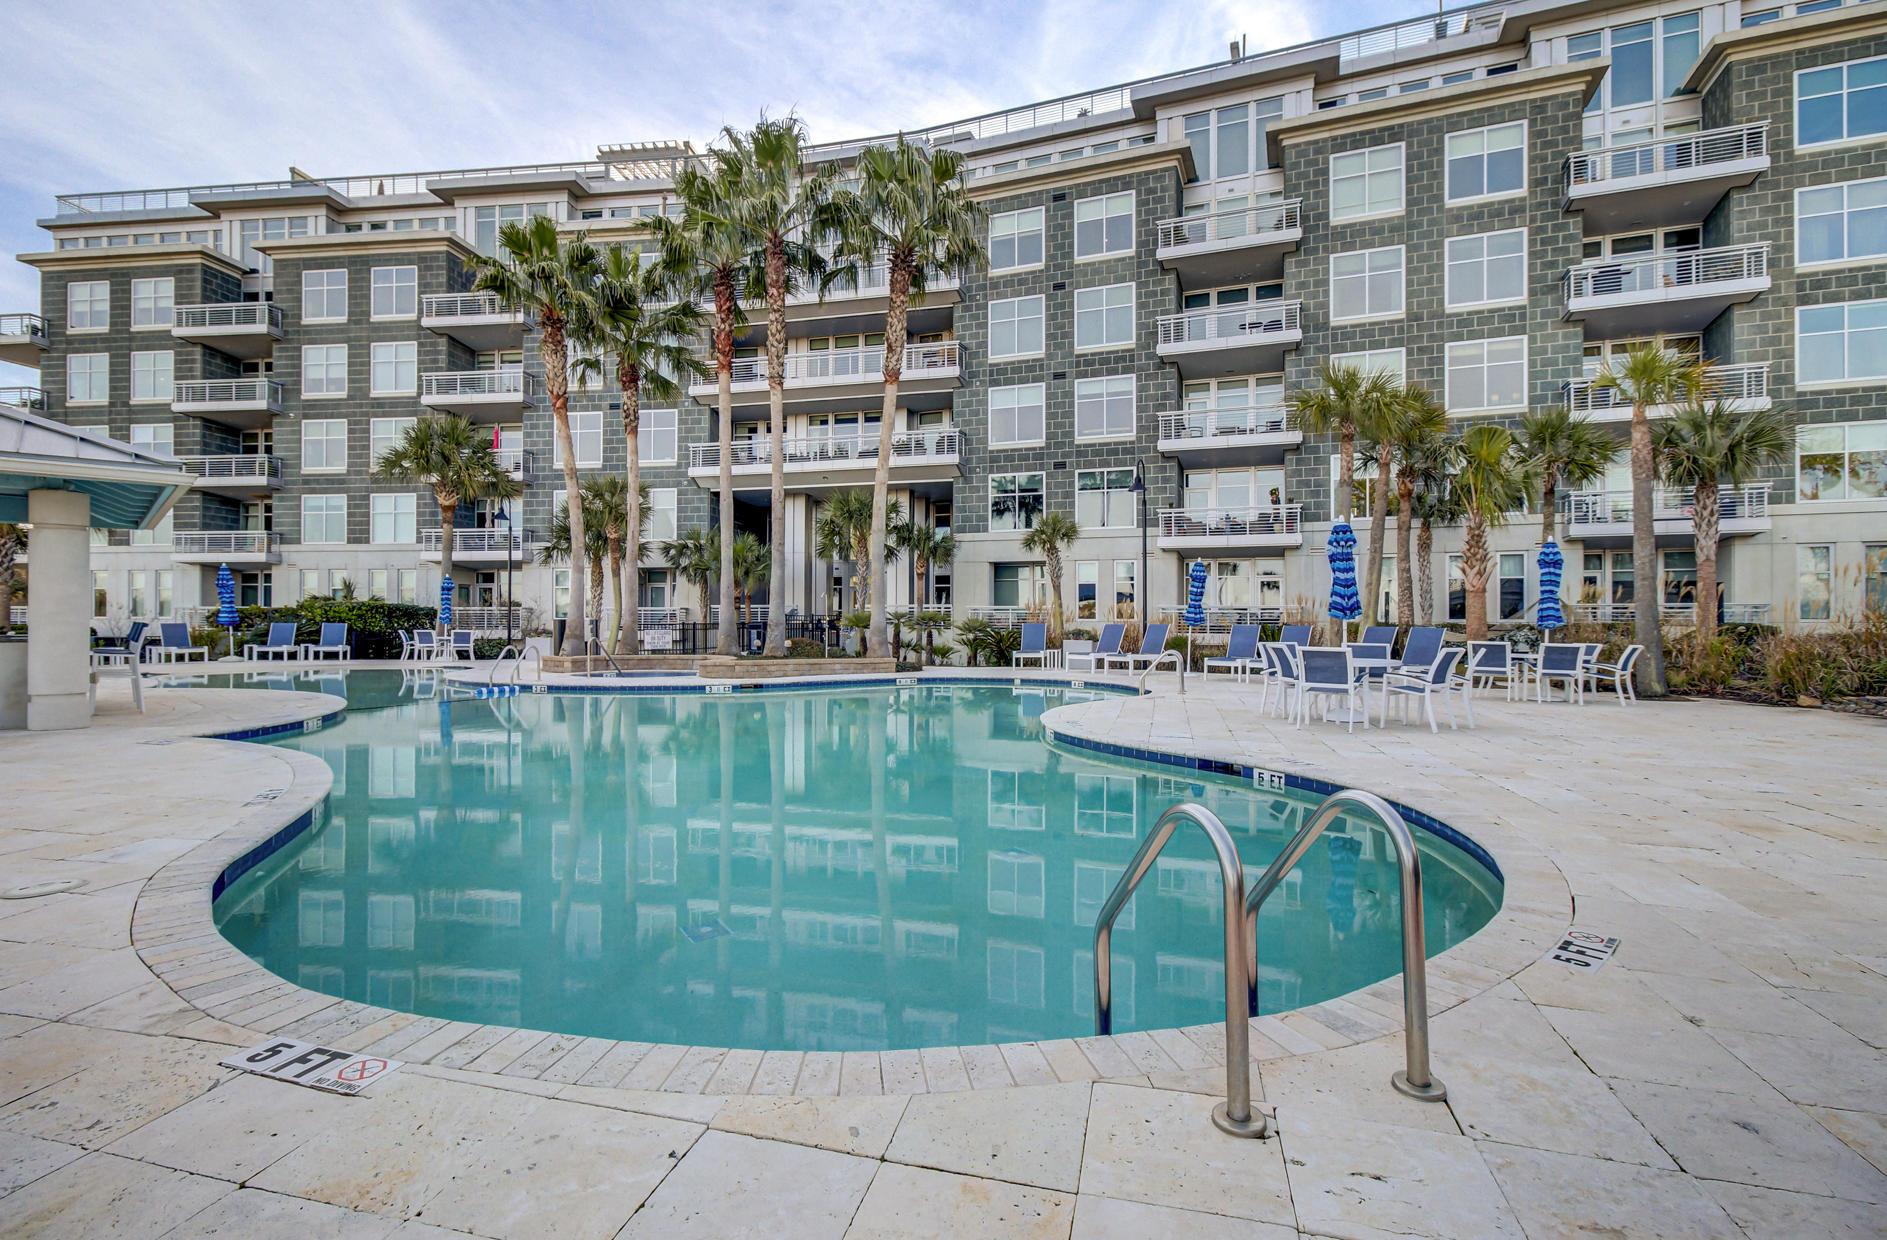 Tides Condominiums Condos For Sale - 142 Cooper River, Mount Pleasant, SC - 26